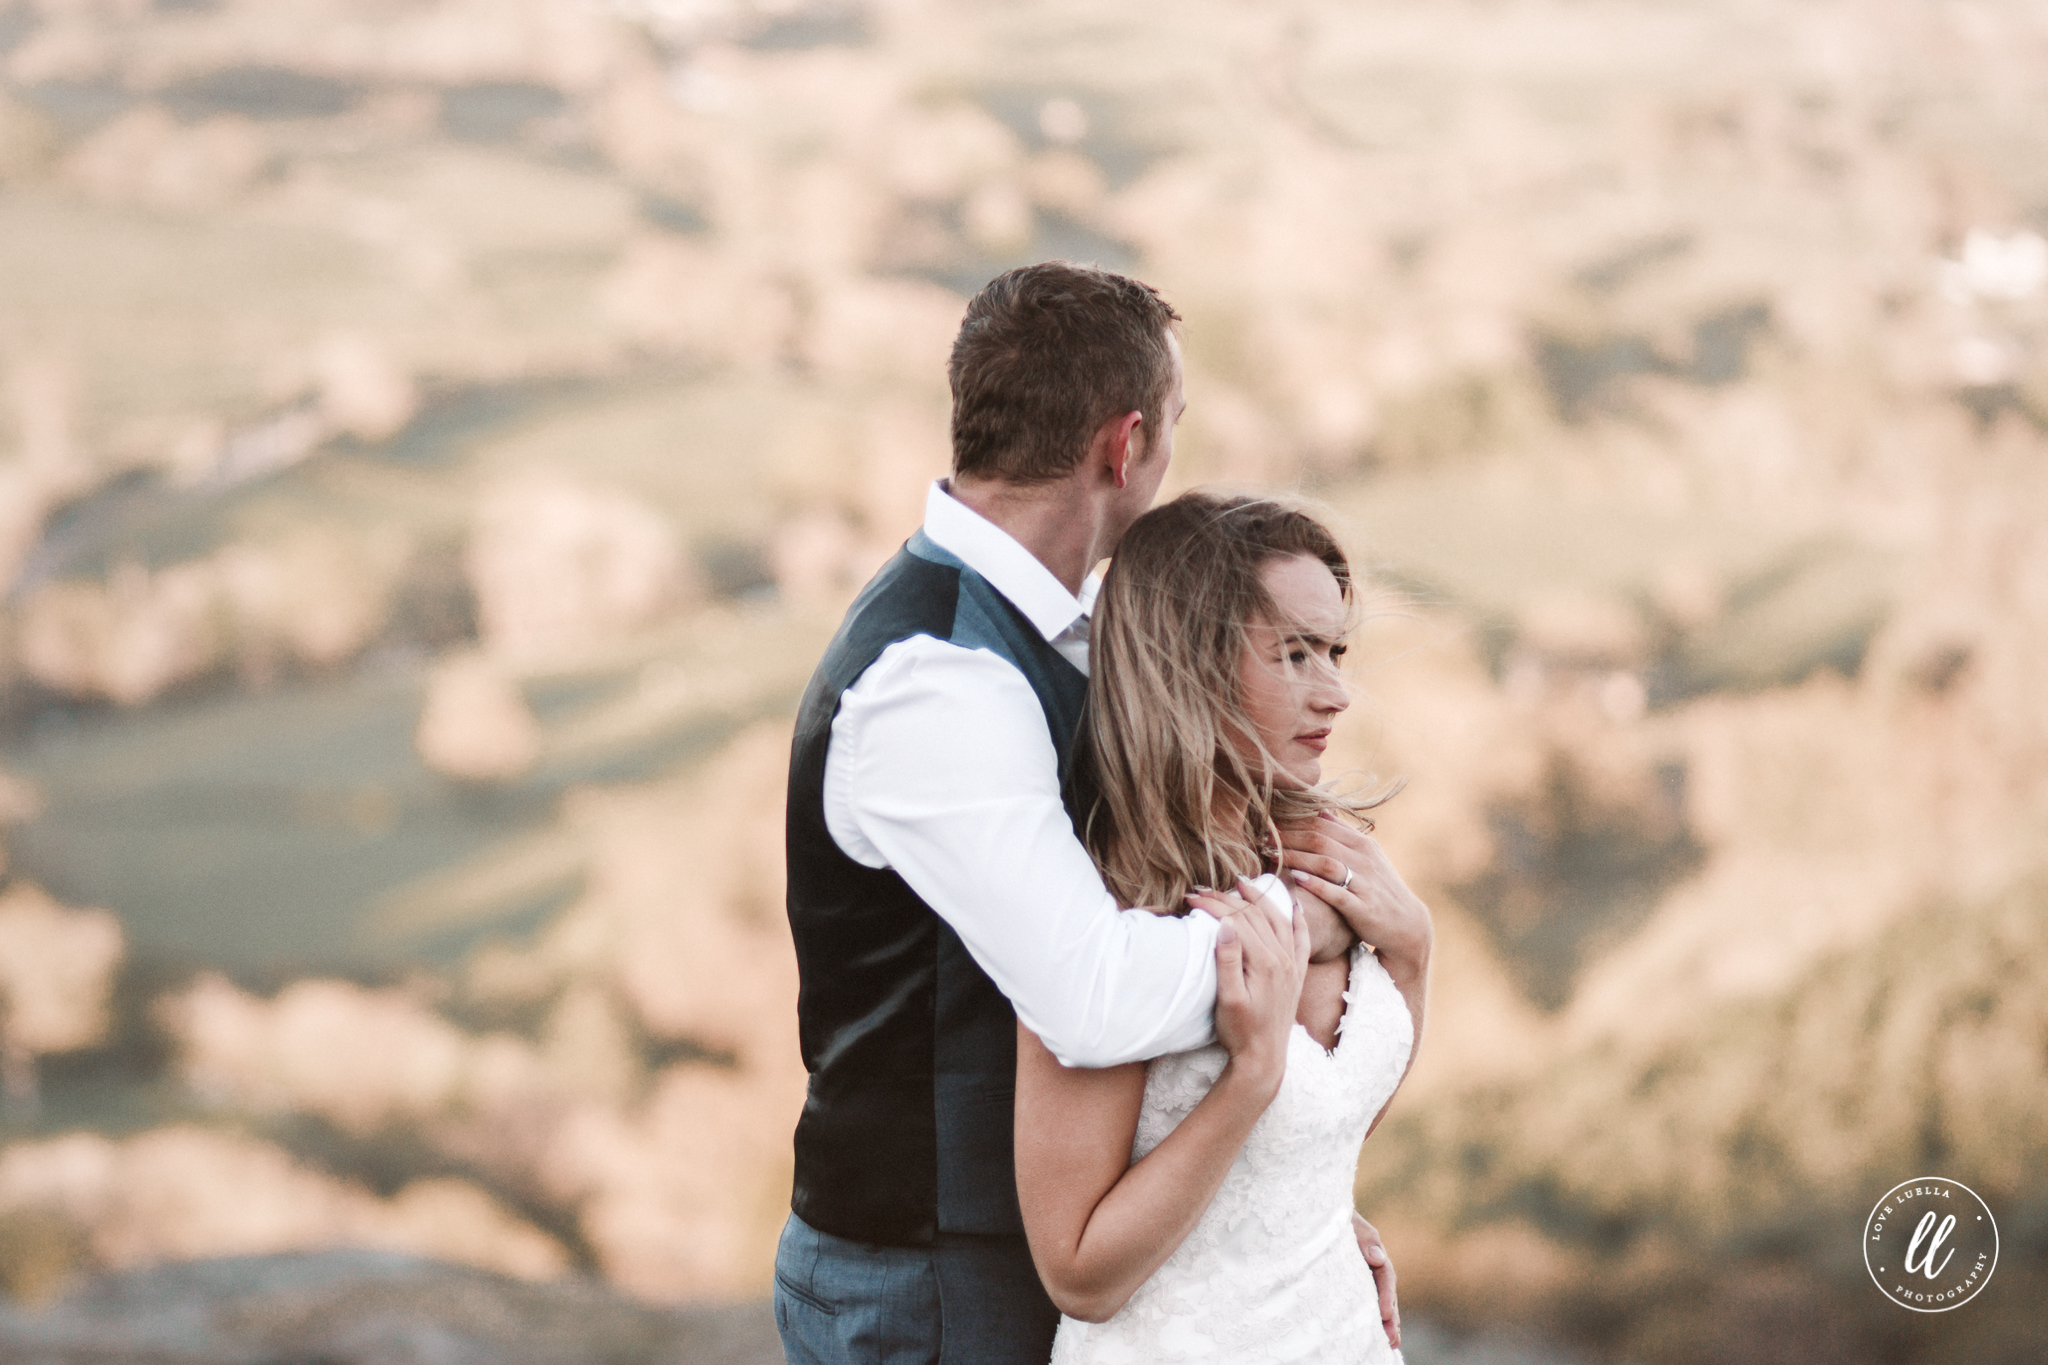 Snowdonia Post Wedding Shoot- Love Luella Photography-142.jpg